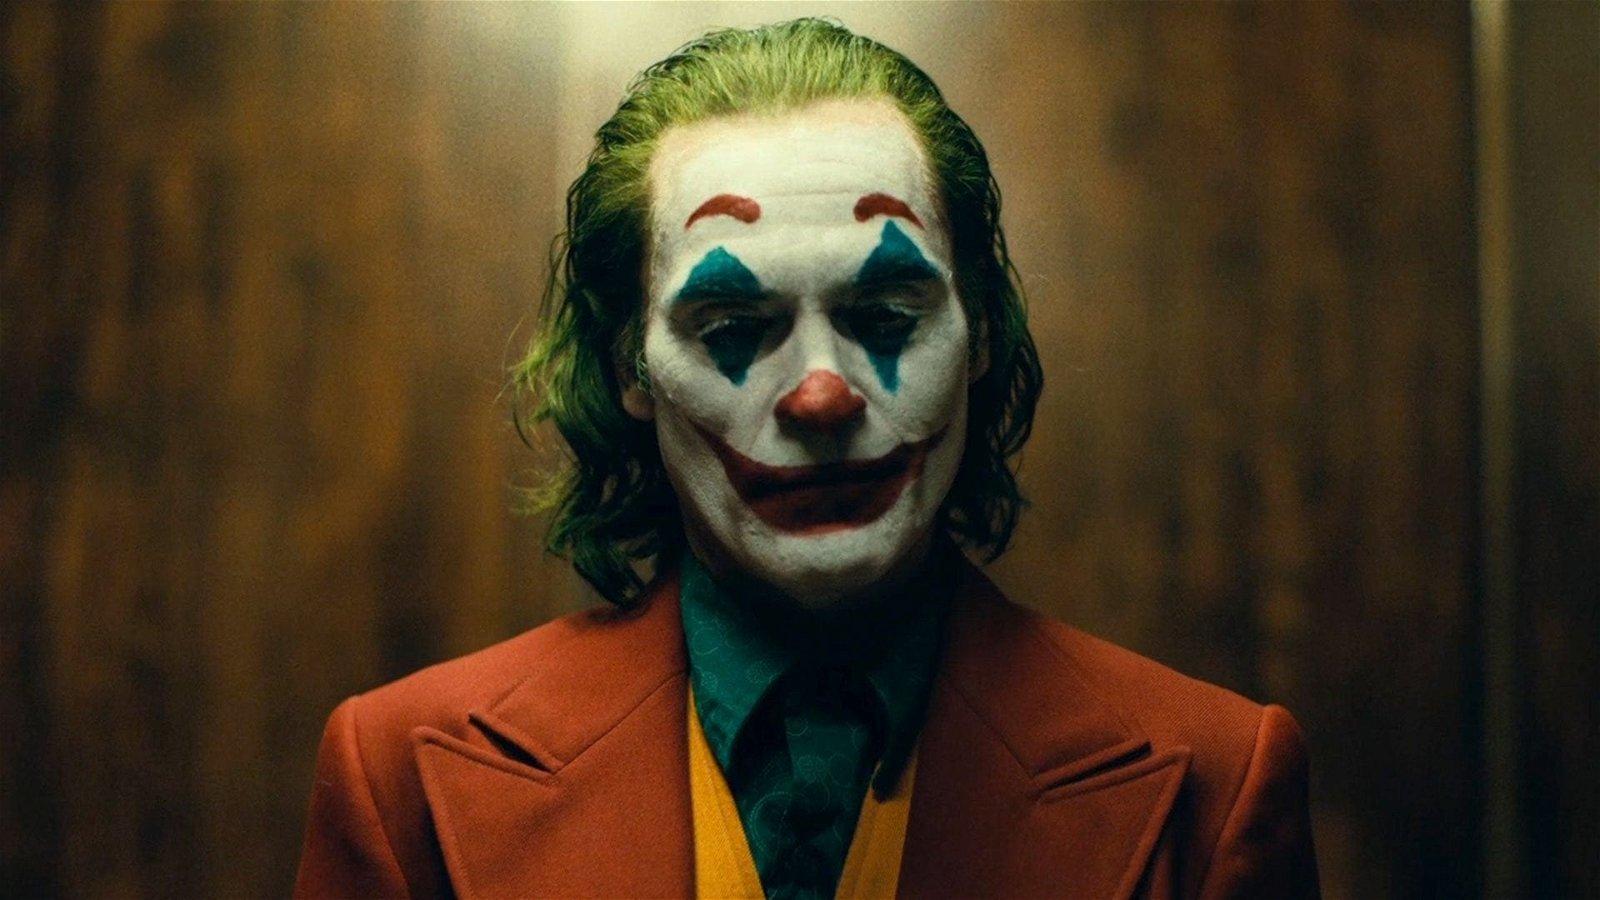 Joker (2019) Review 2